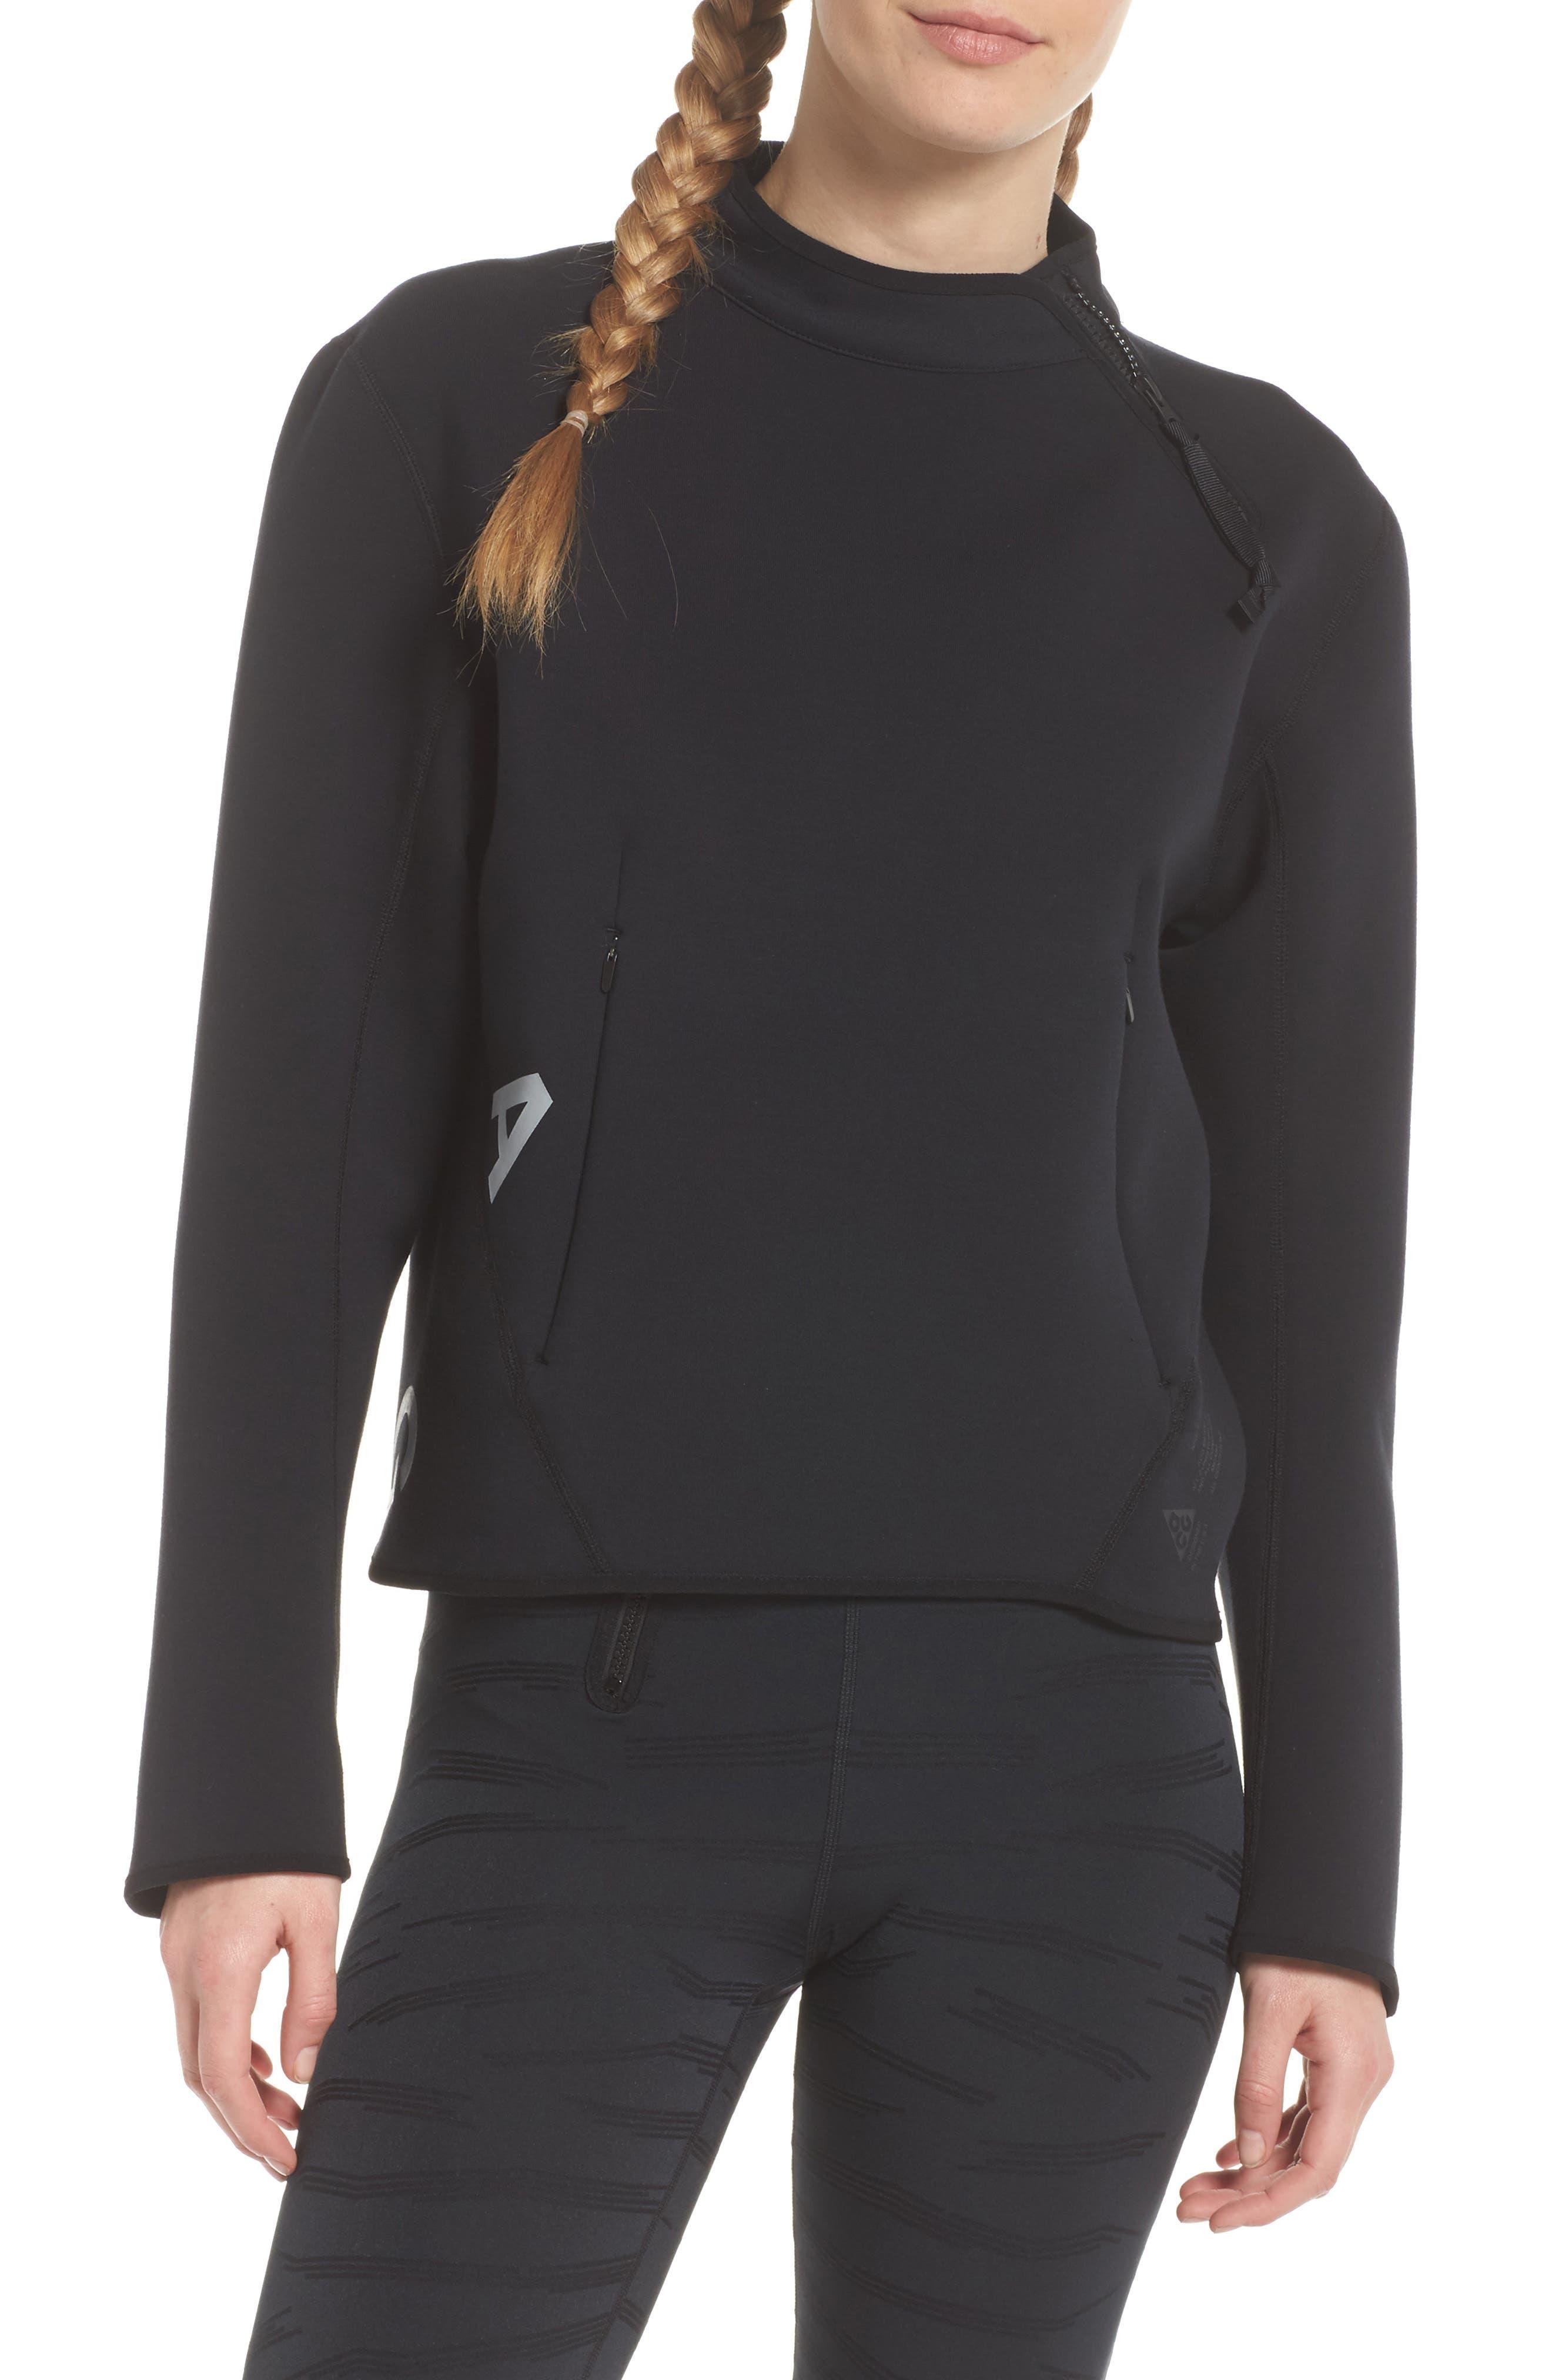 Main Image - Nike NikeLab ACG Fleece Women's Crewneck Top